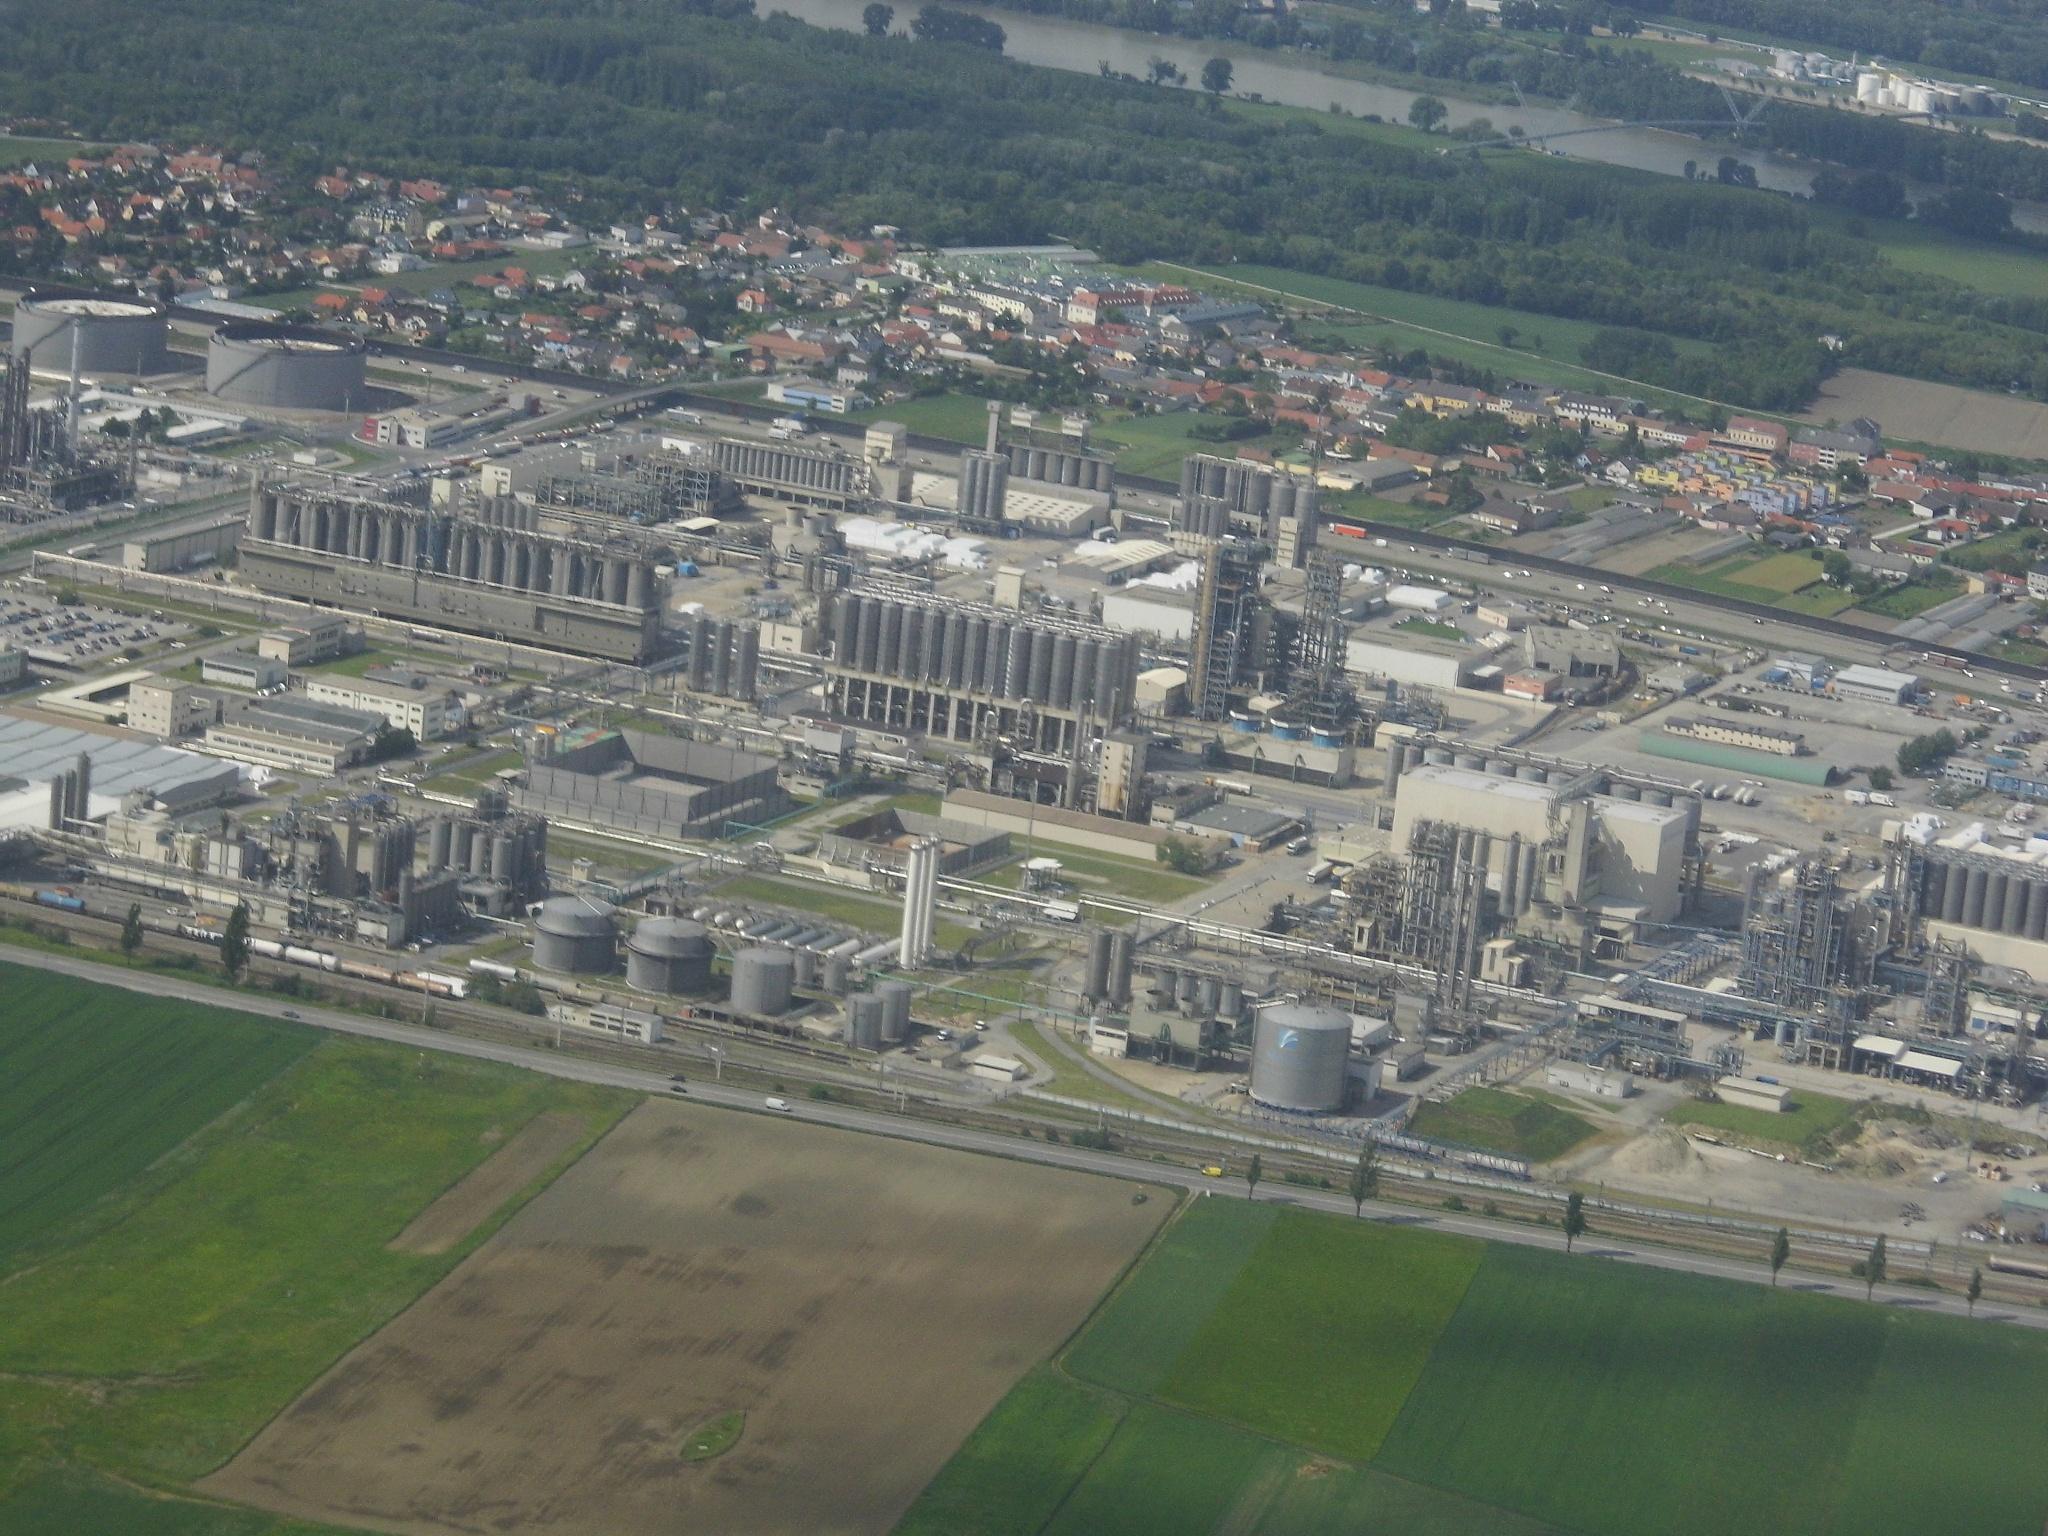 Vienna Industrial Zone by MJD